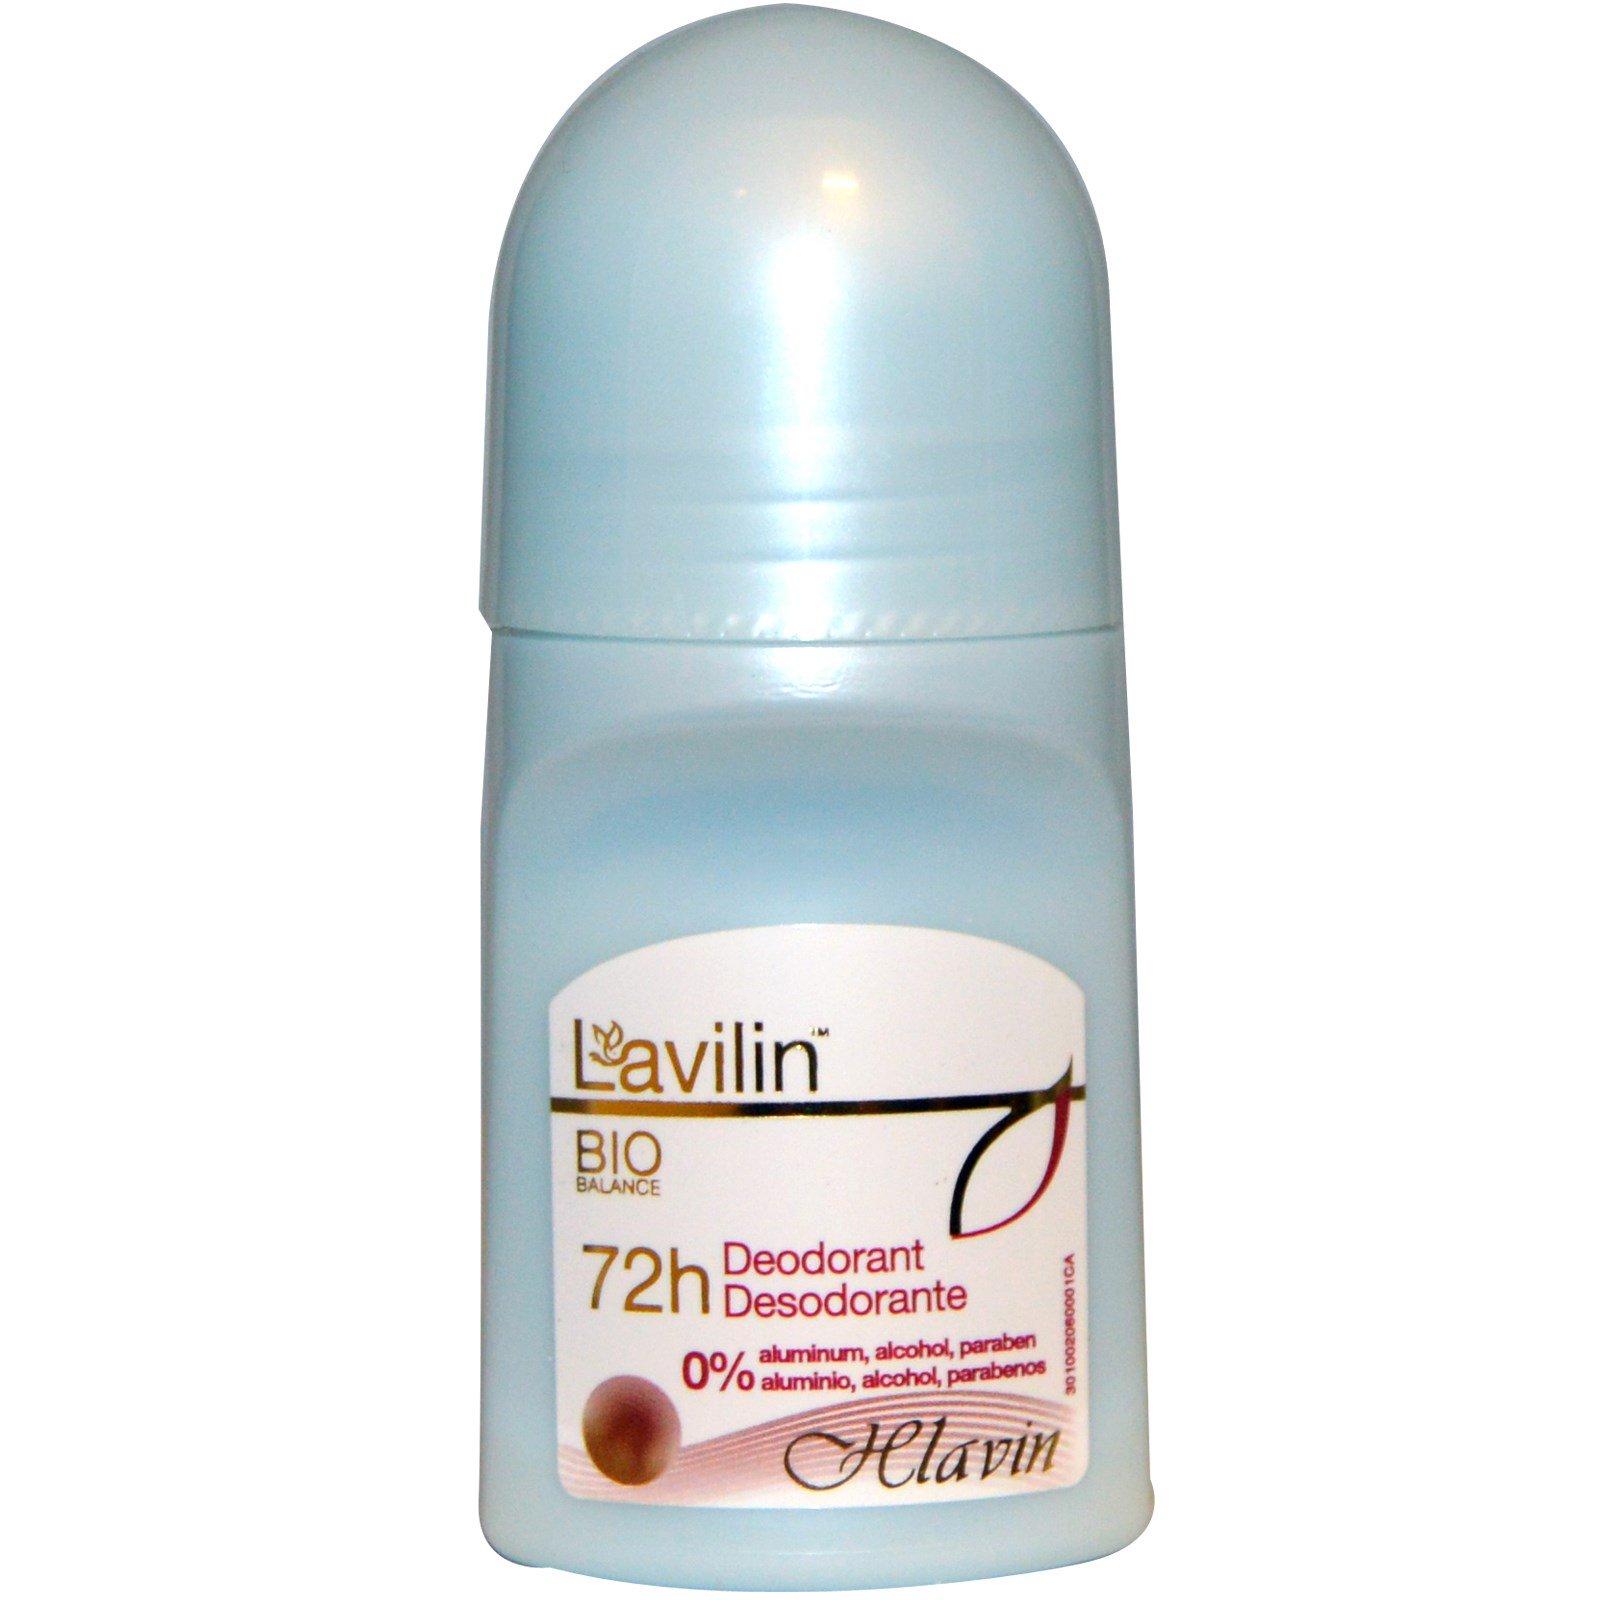 Lavilin Bio Balance 72 Hour Roll On Deodorant Unisex